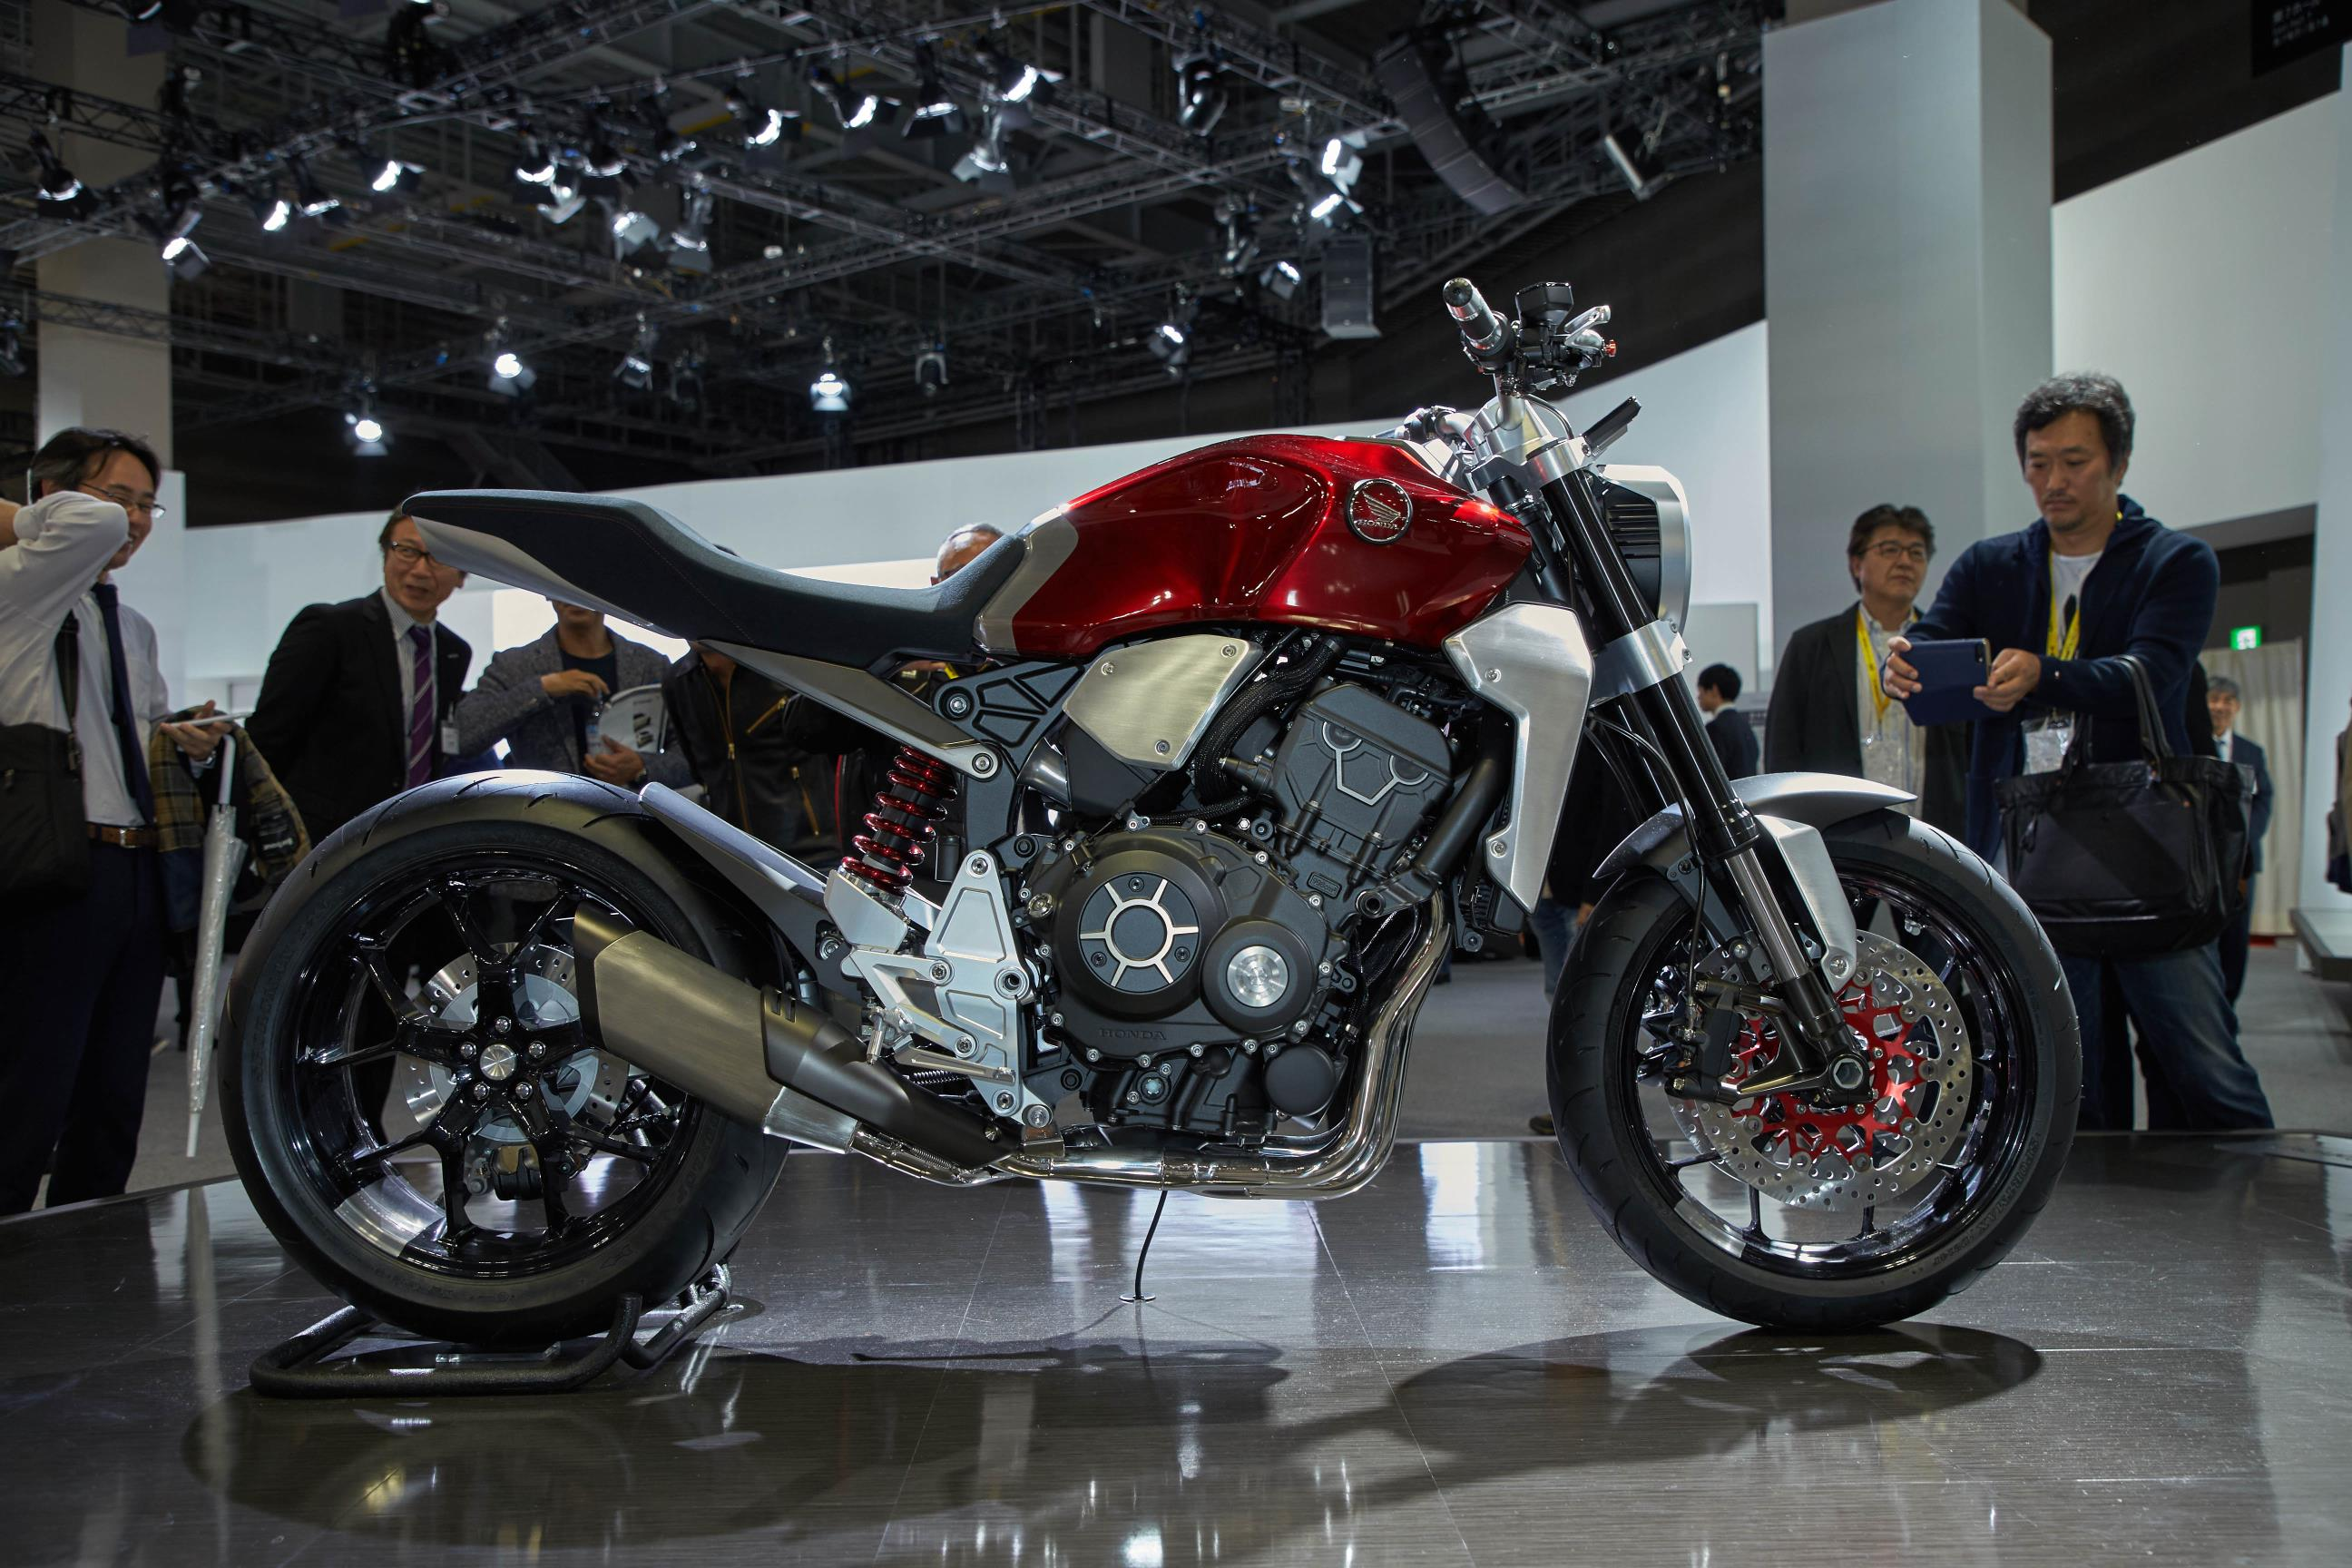 Tokyo motor show 2017 (269)